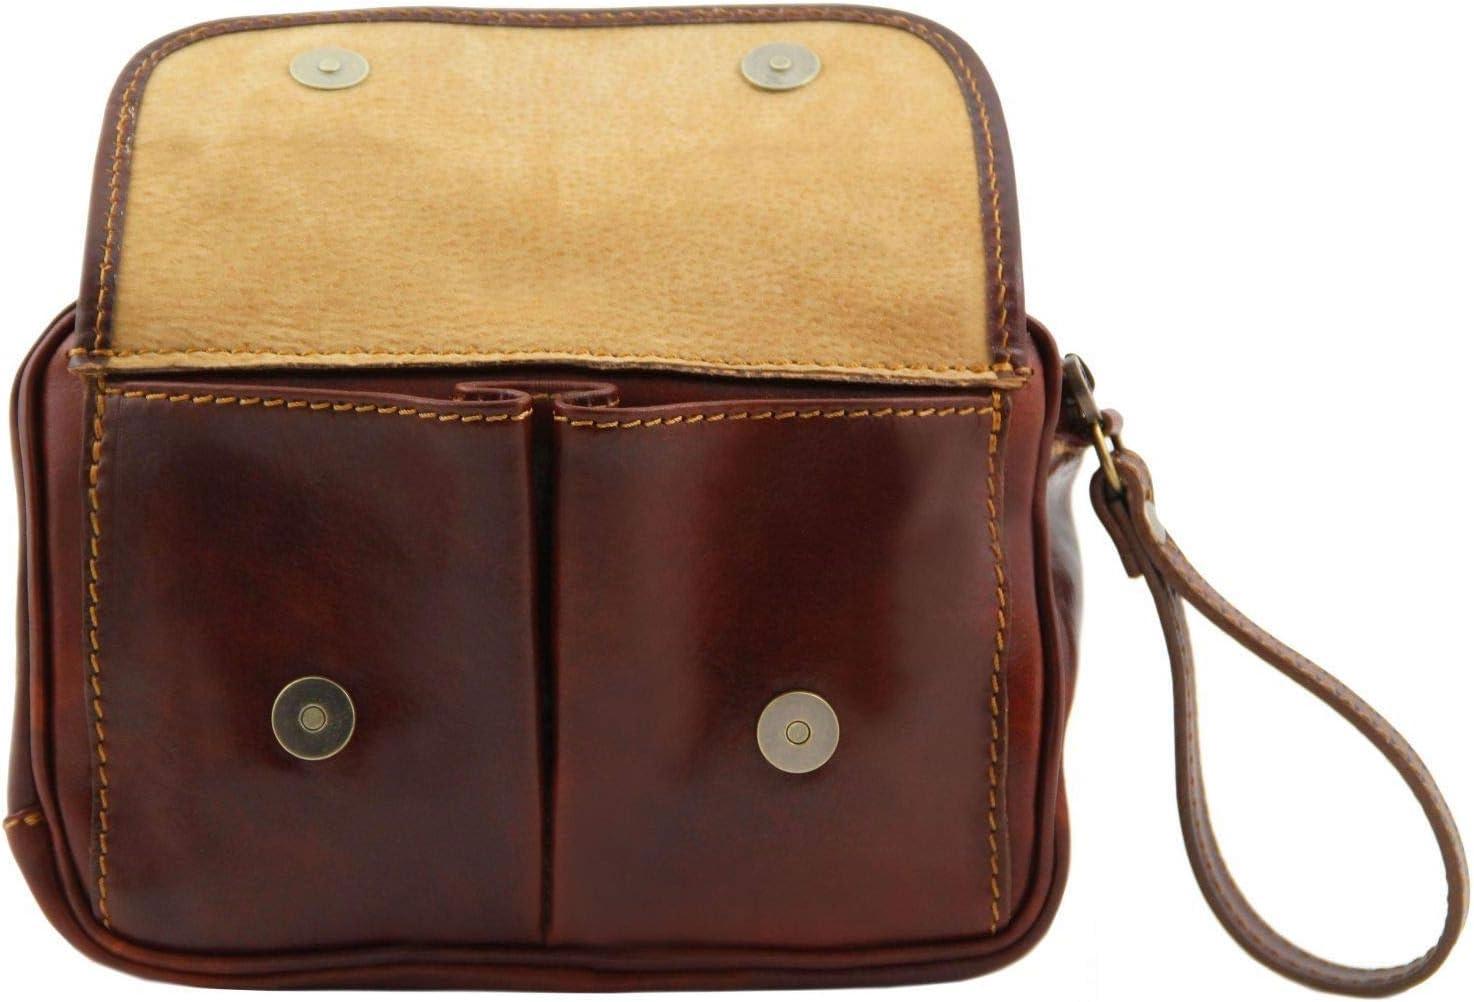 Tuscany Leather Ivan Borsello a mano in pelle Marrone